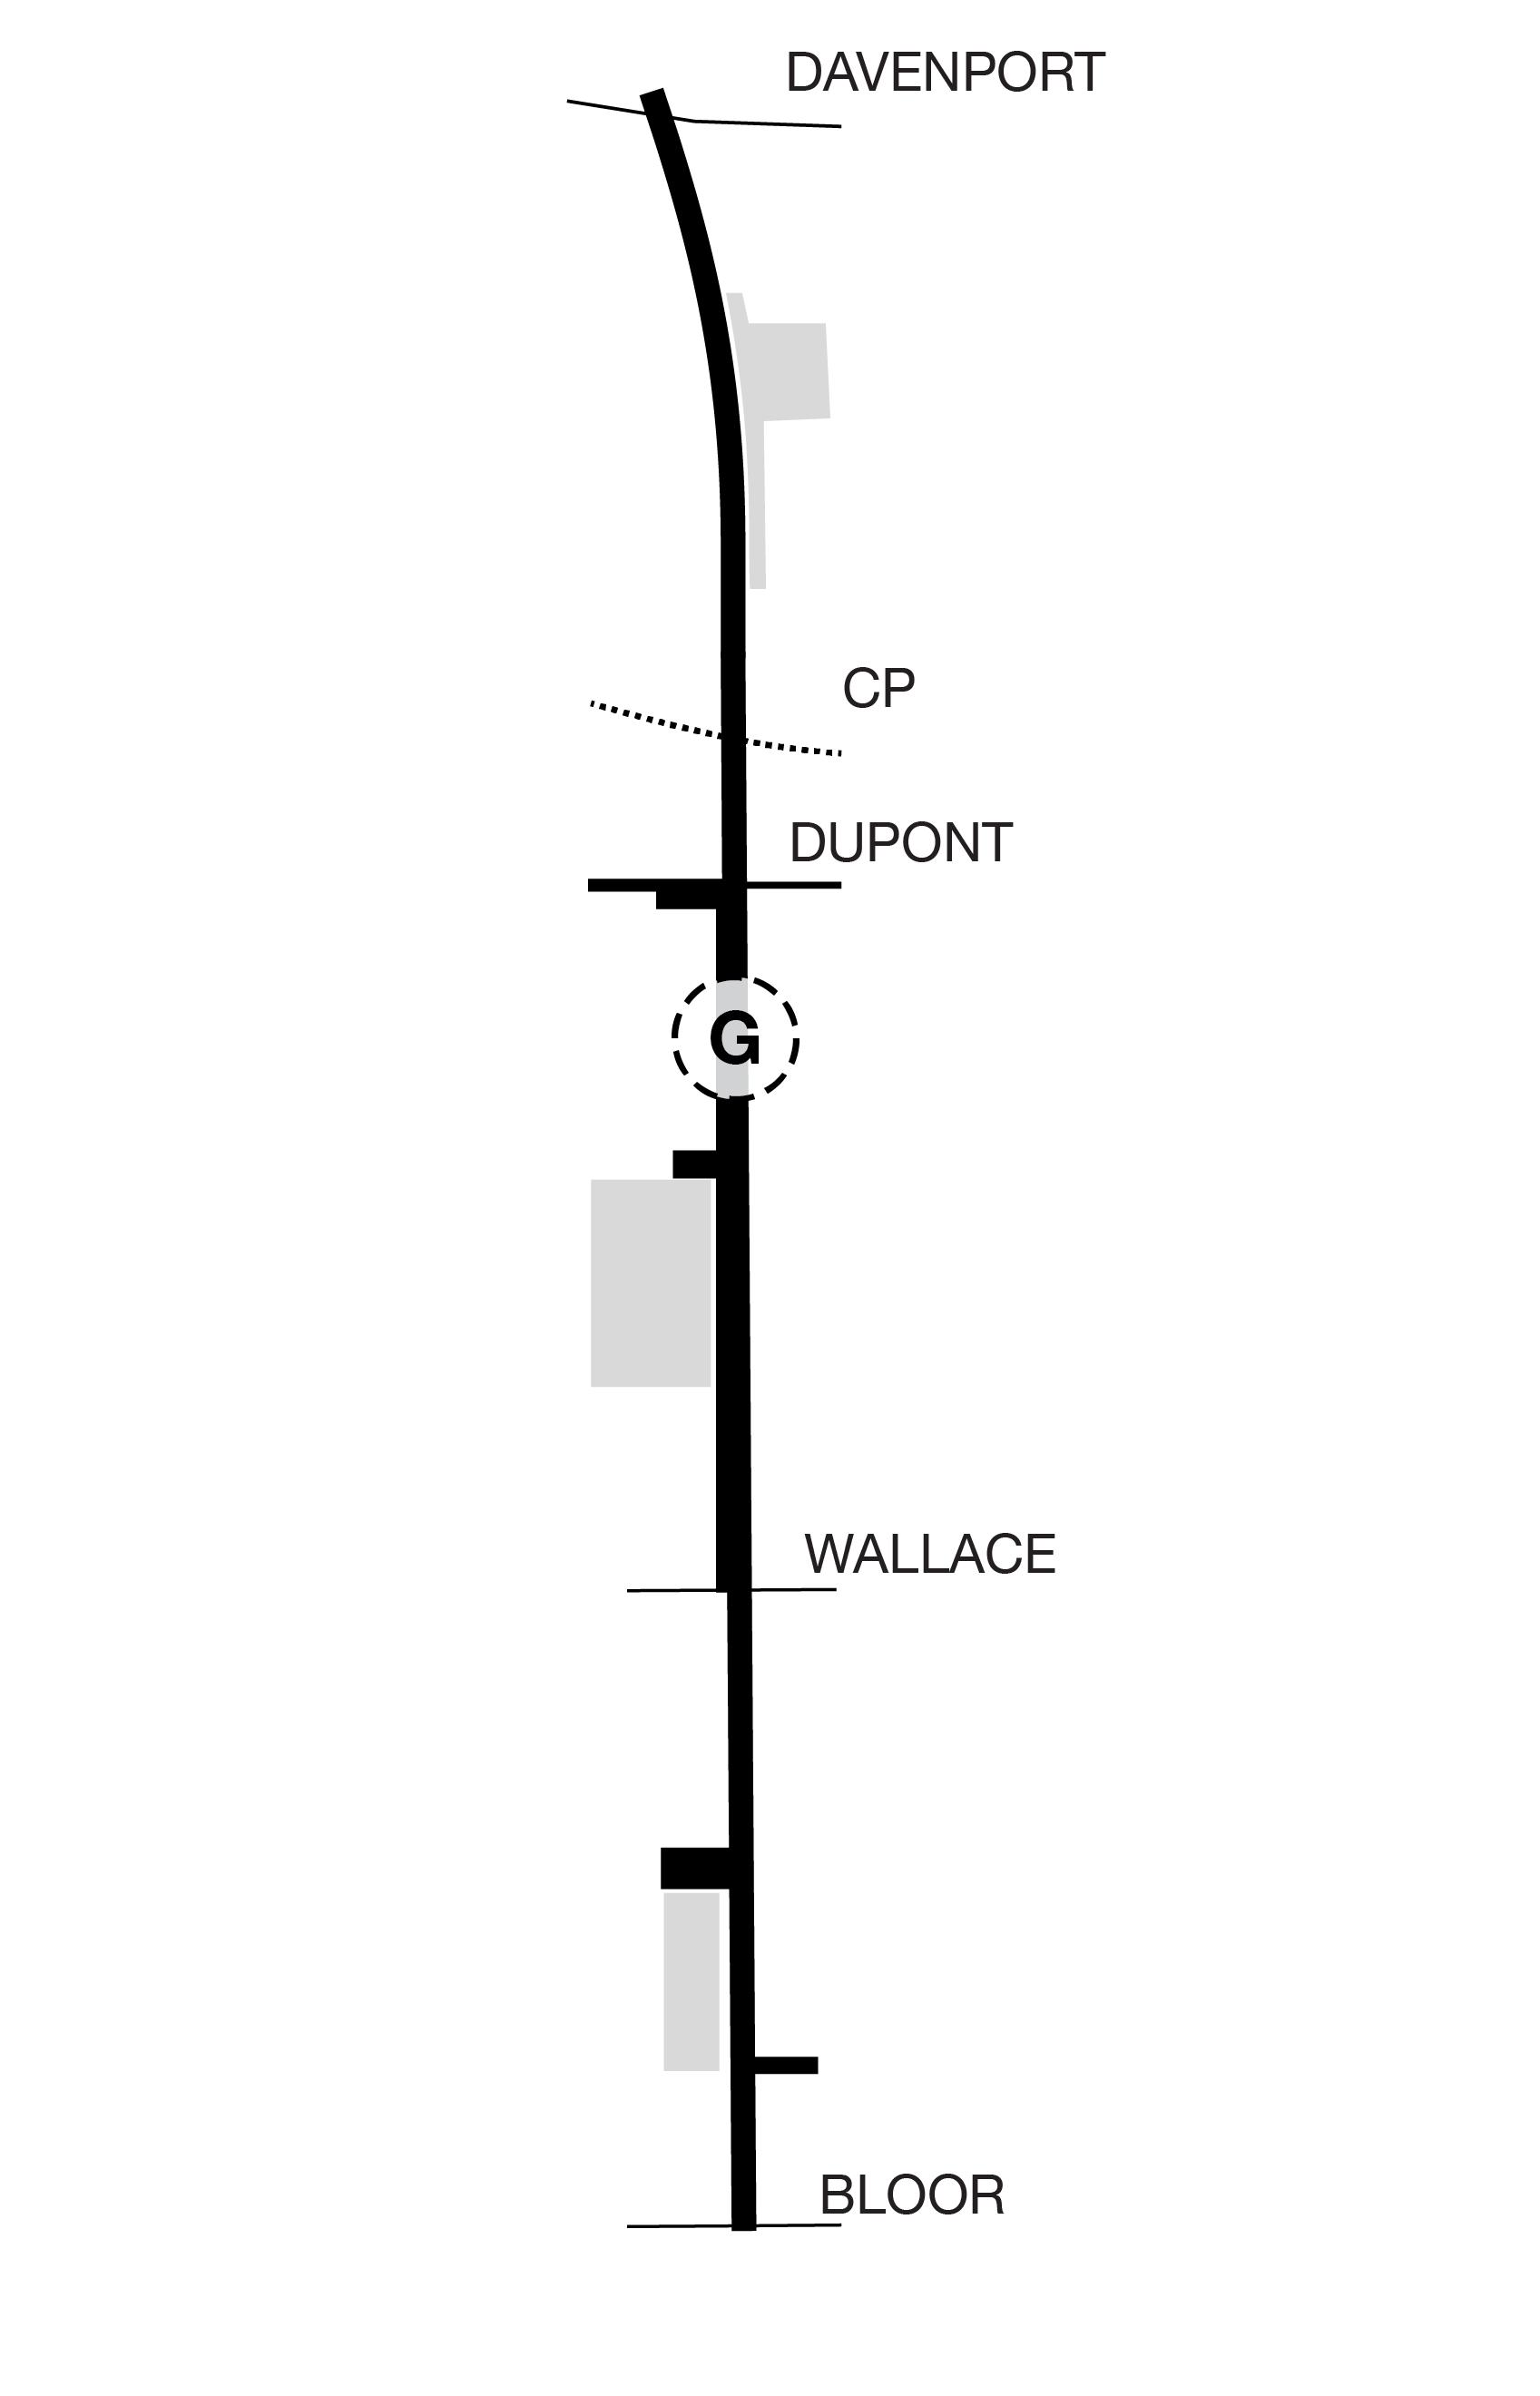 gh3-DD-plan-diagram-2-G.png